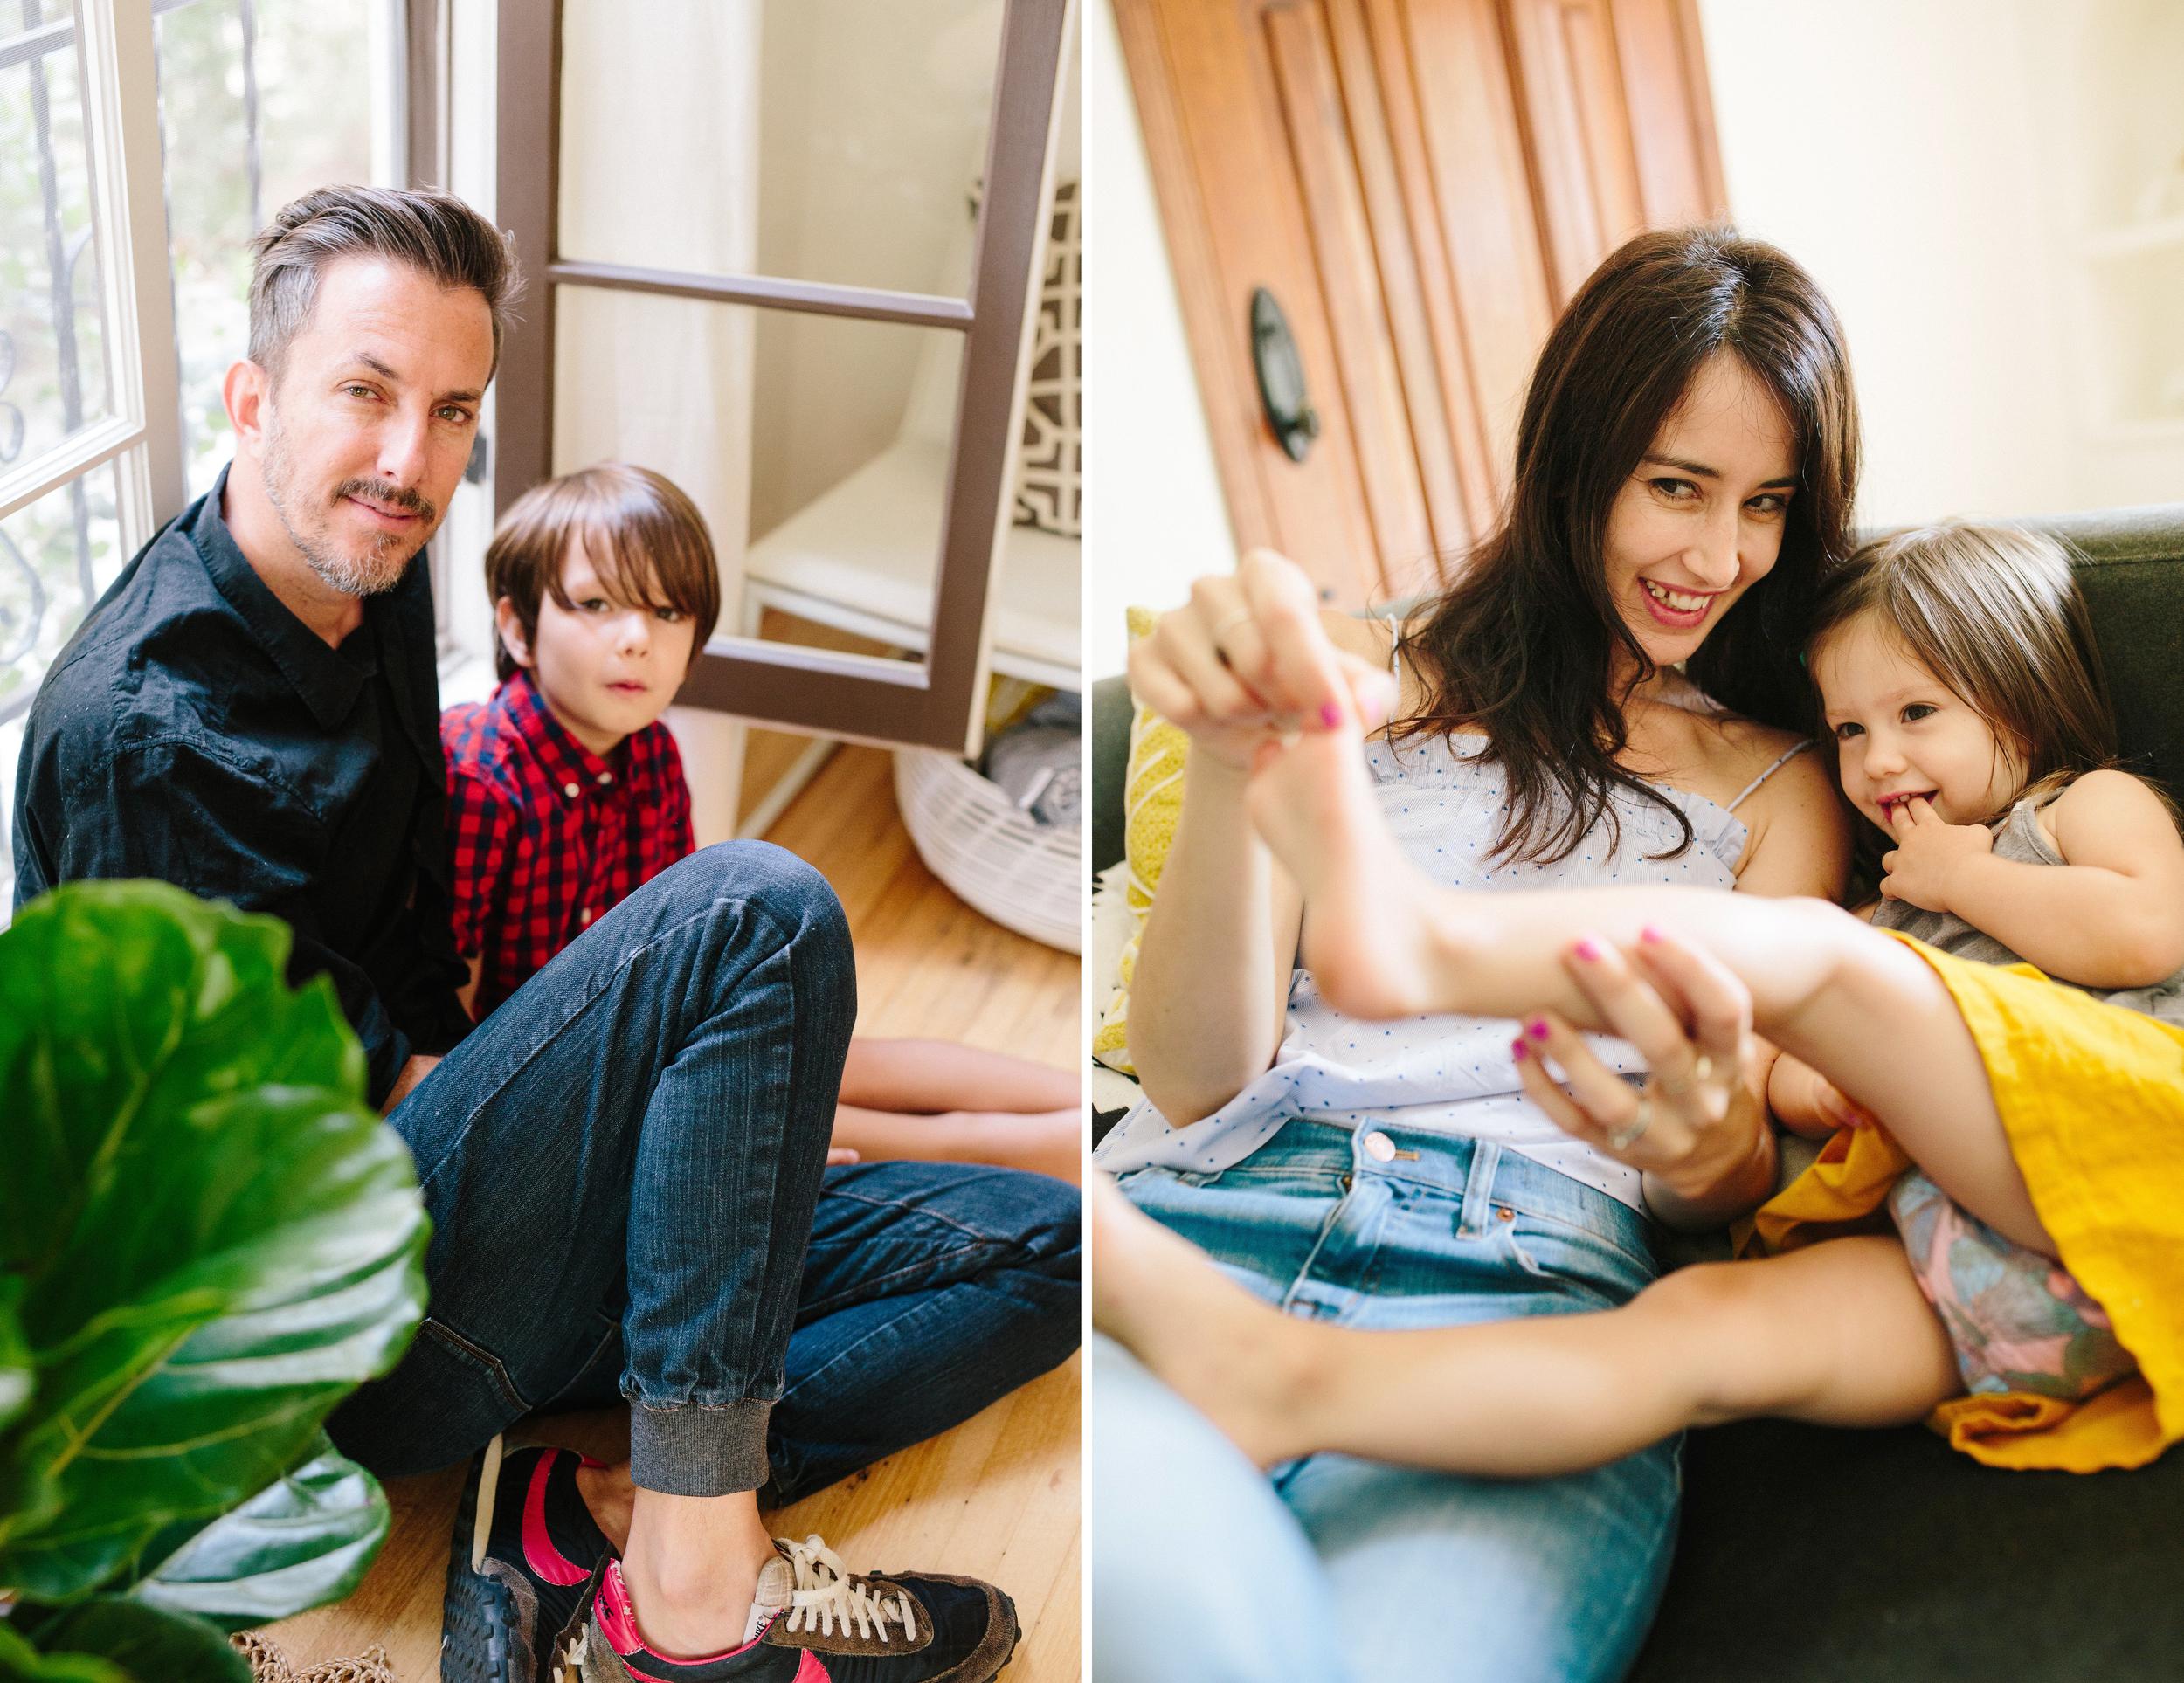 los-angeles-lifestyle-family-child-kid-baby-photographer_9.jpg